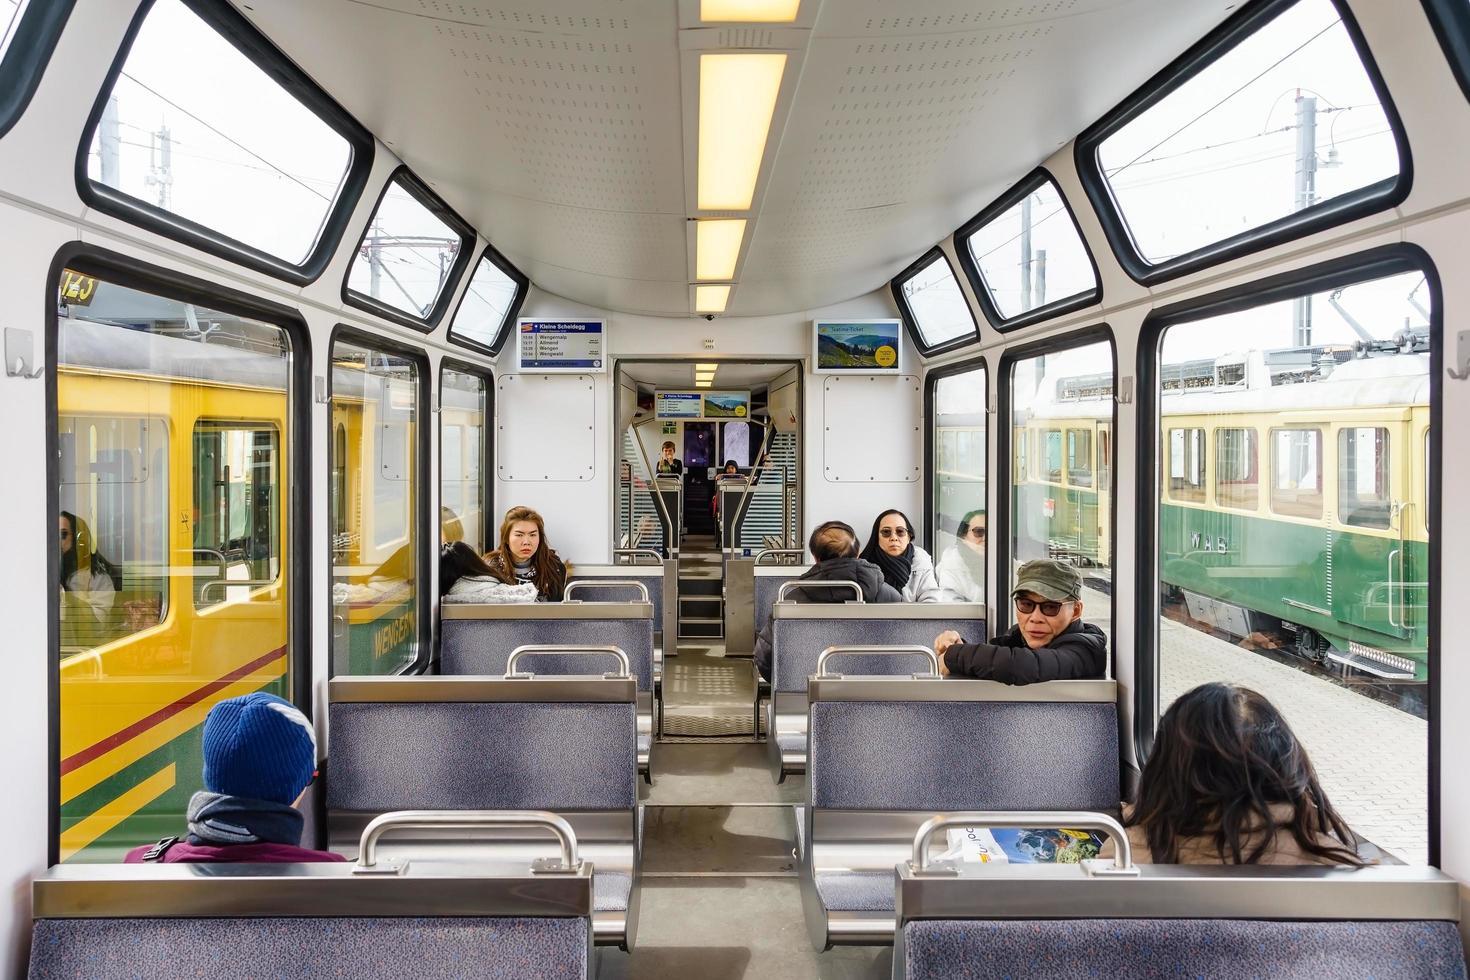 treno a interlaken, svizzera, 2018 foto